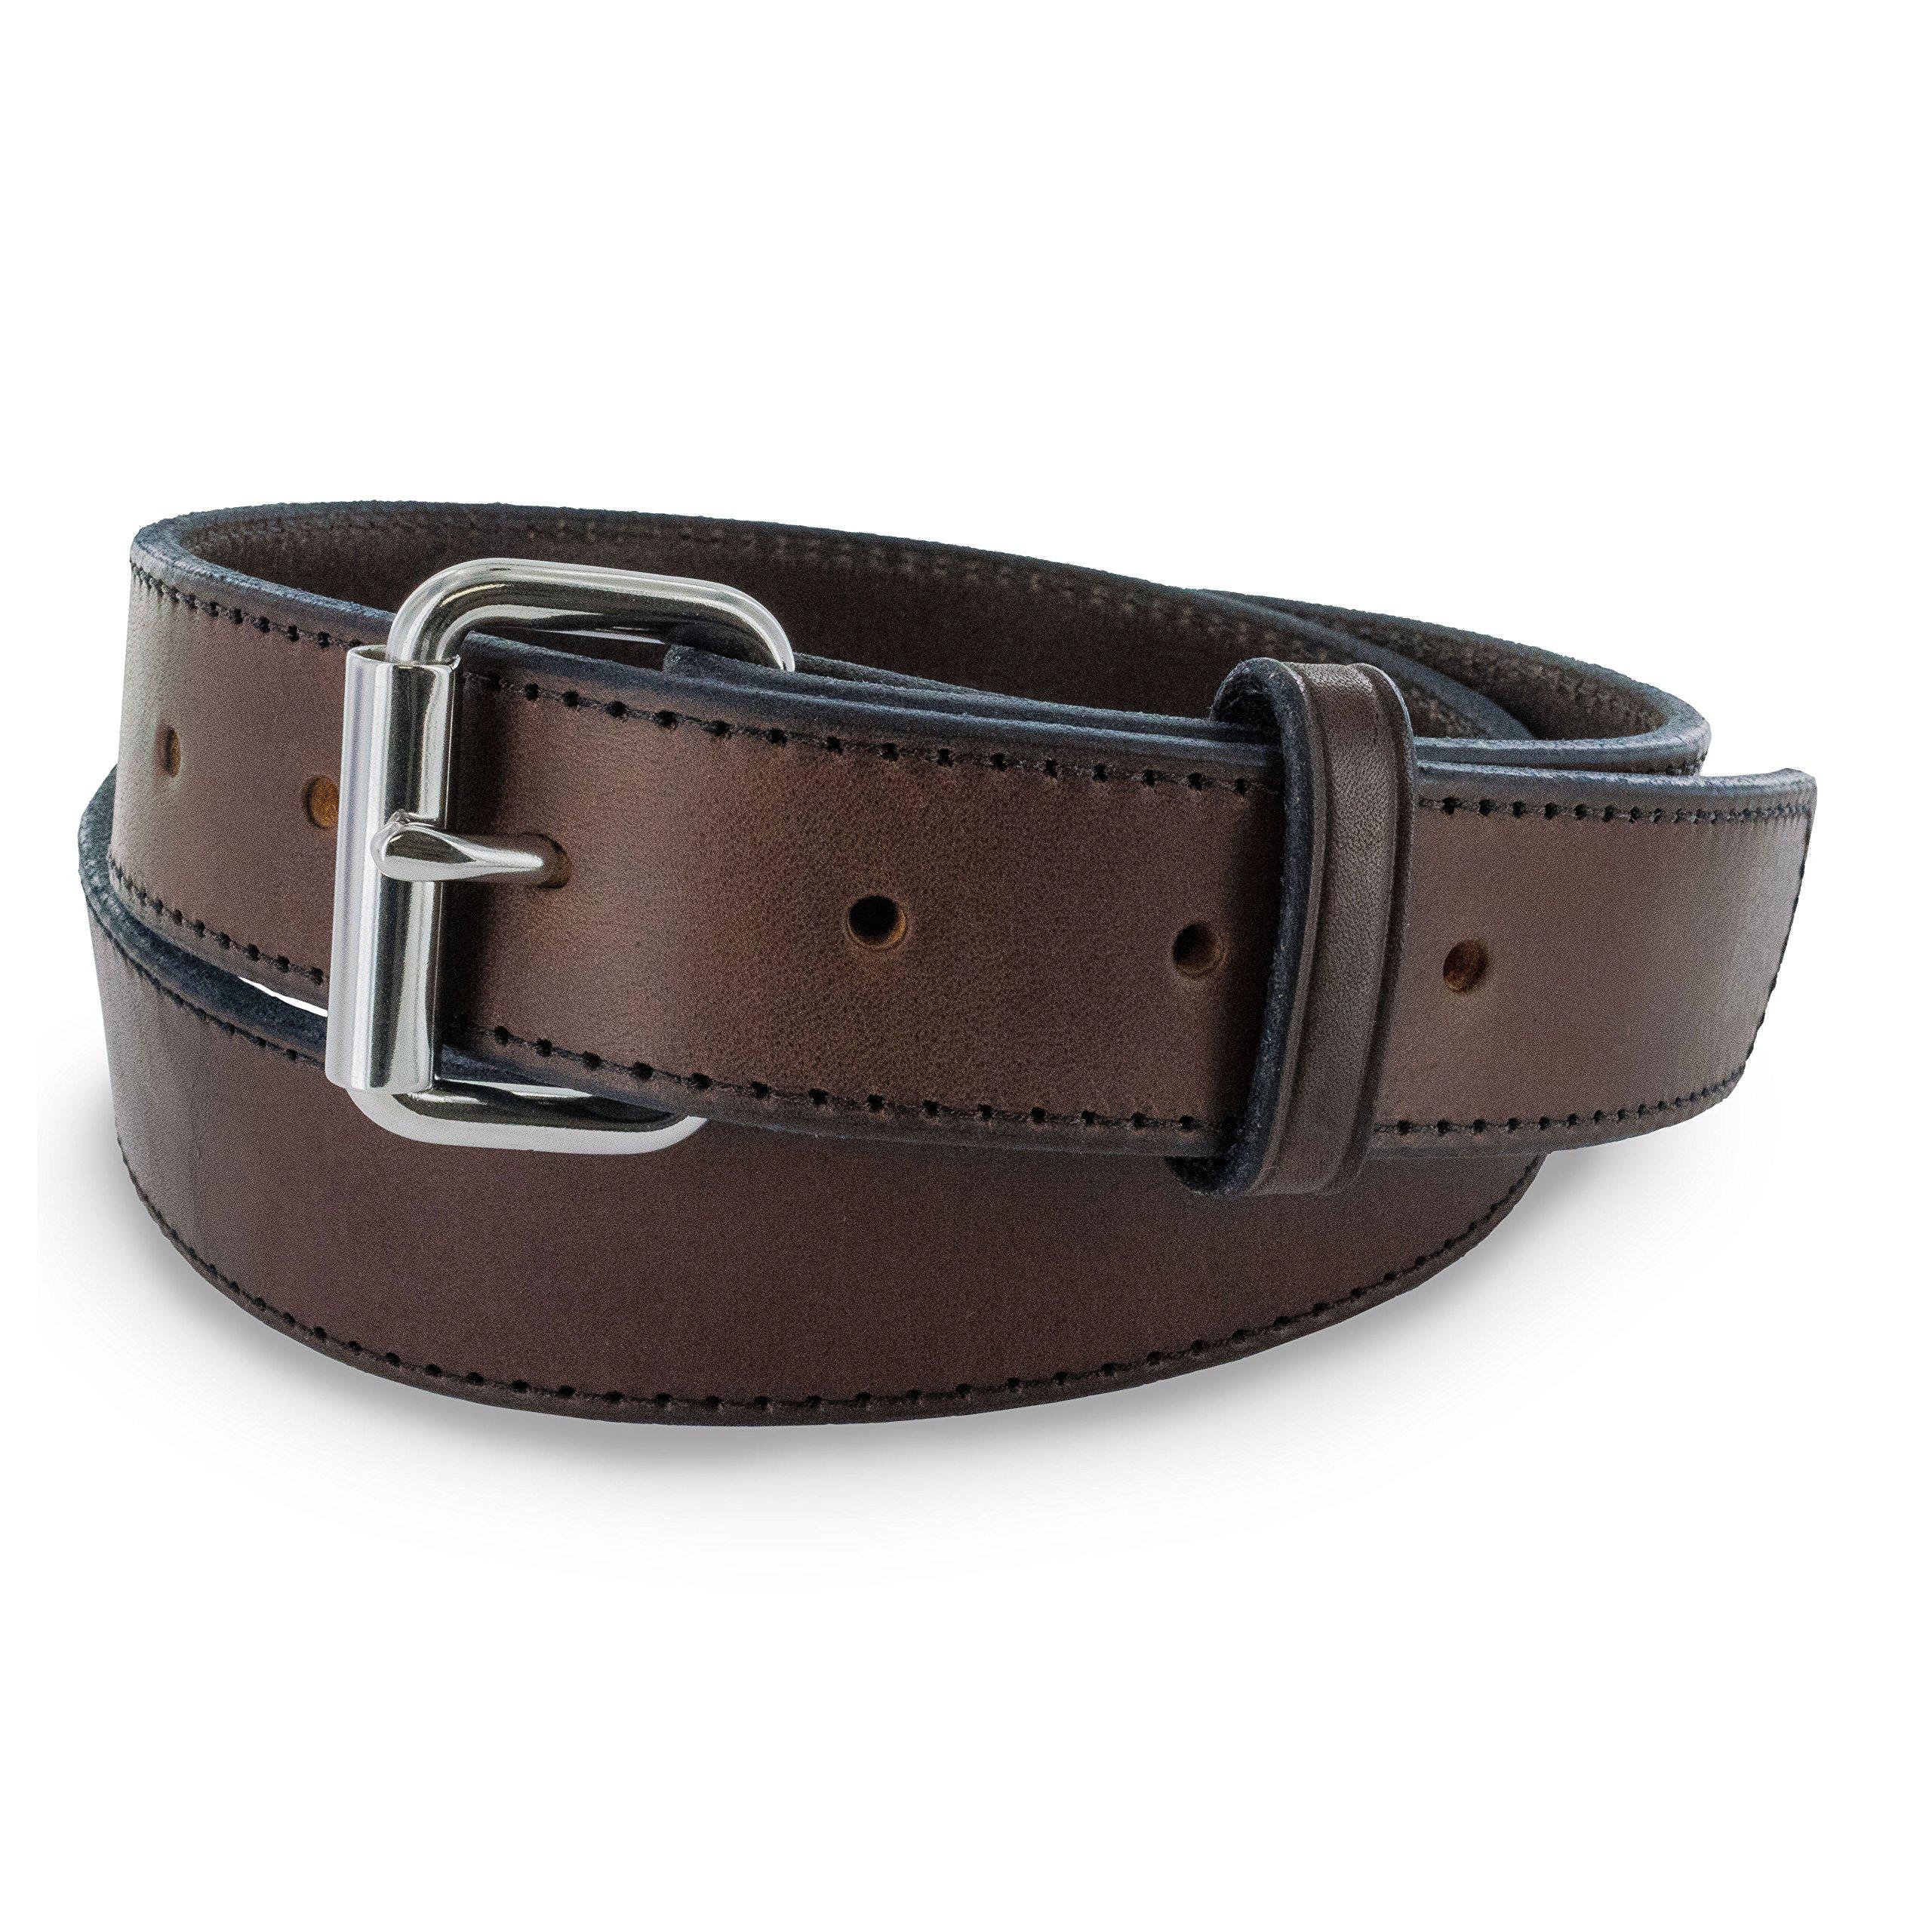 Hanks Stitch Gunner Belts - 1.5'' Best Vaue in A Concealed Carry Belt - USA Made 13OZ Leather - 100 Year Warranty - BRN - 38 by Hanks Belts